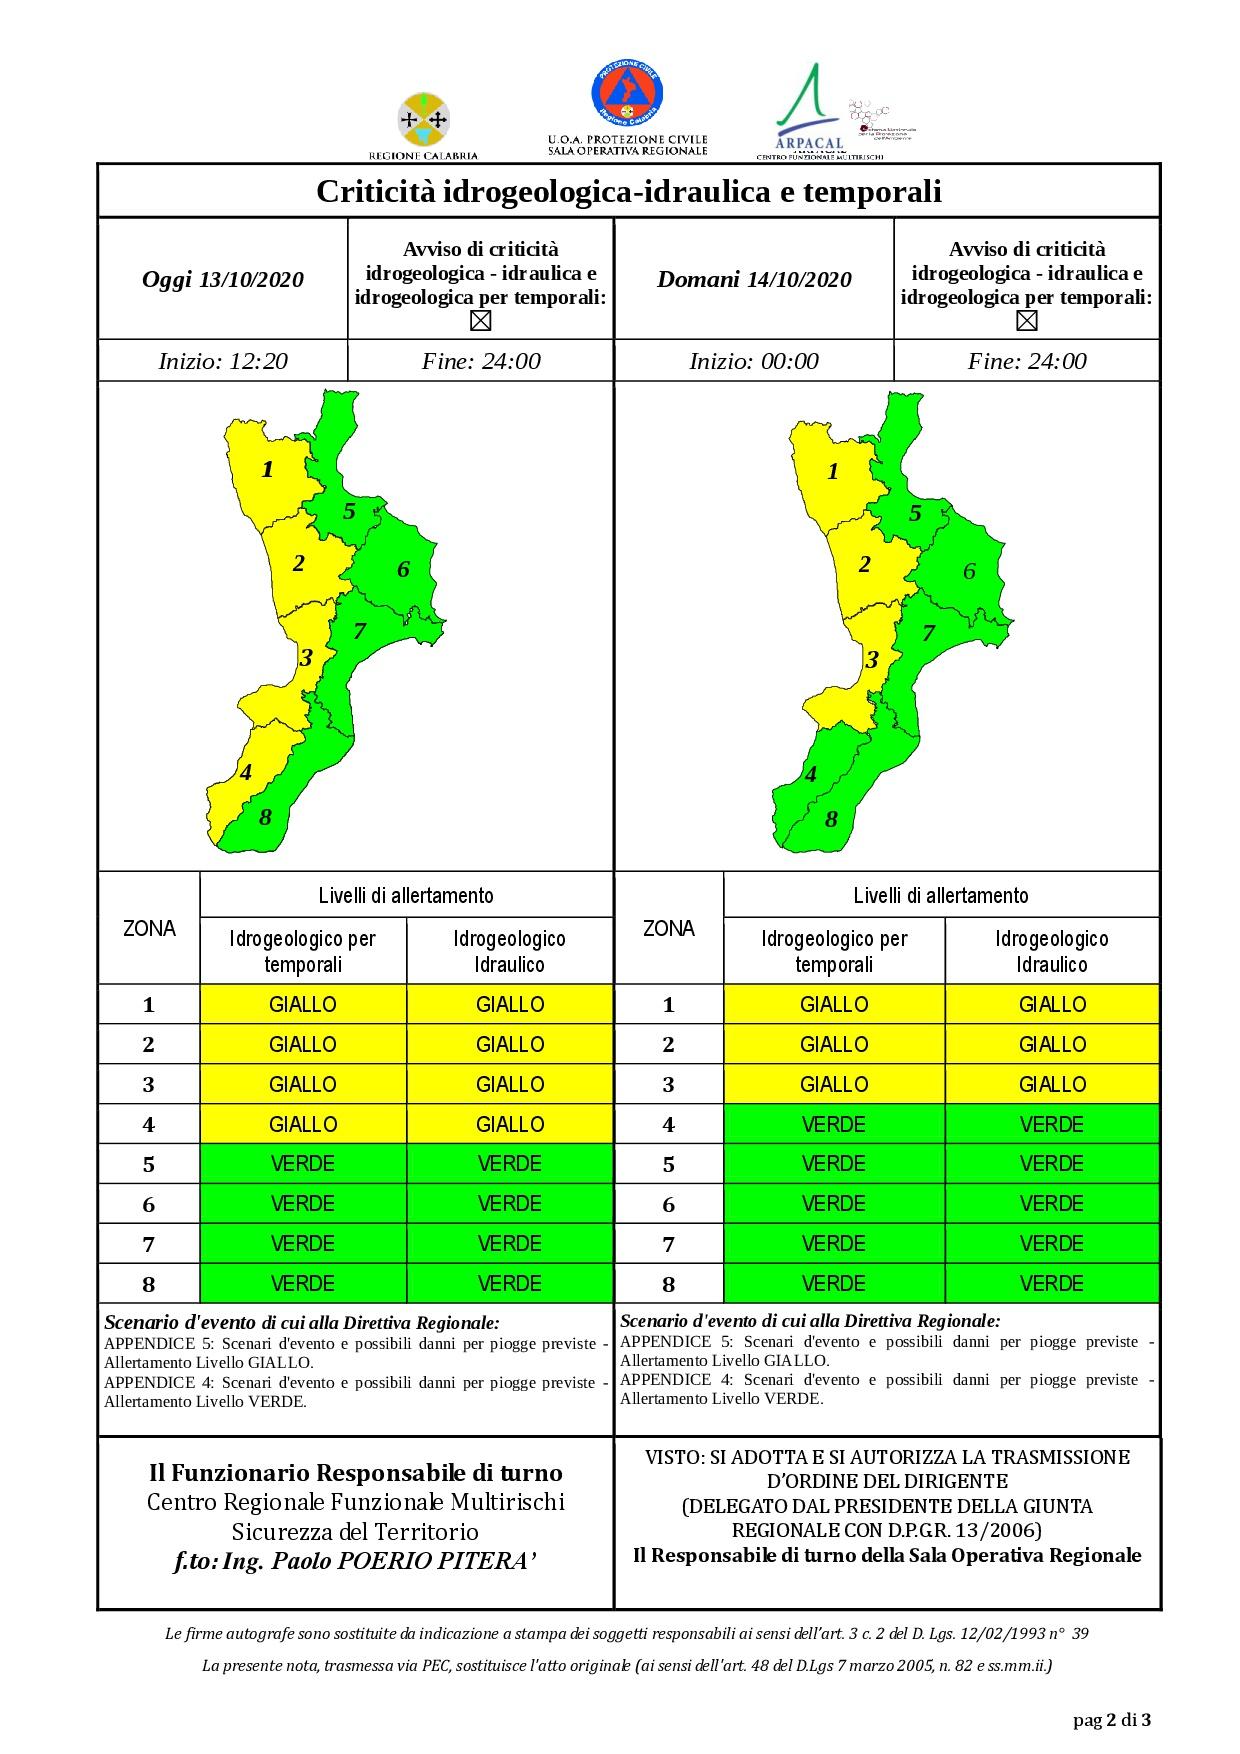 Criticità idrogeologica-idraulica e temporali in Calabria 13-10-2020